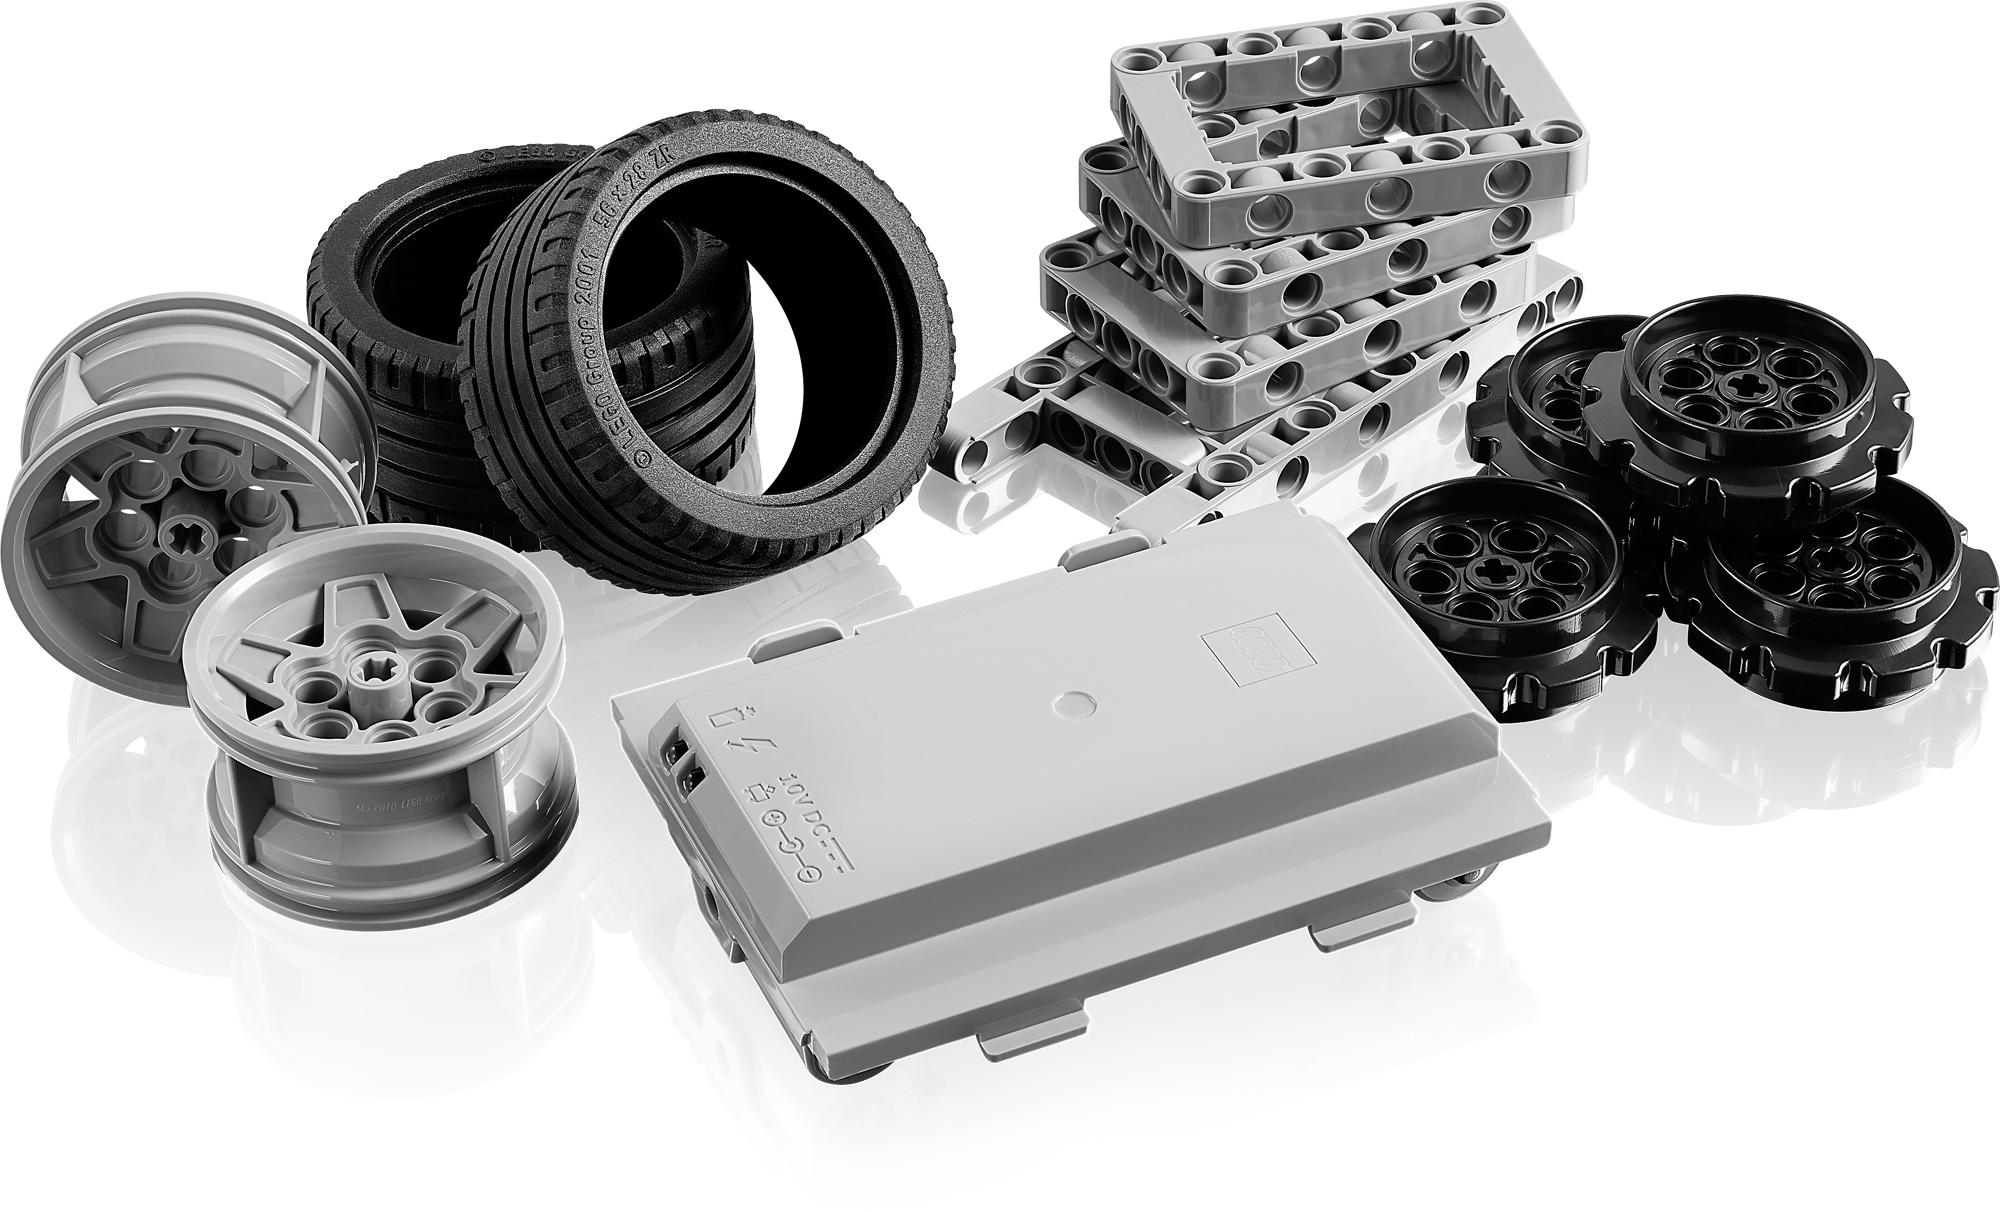 Lego Mindstorms EV3: Neue Roboterplattform von Lego - Lego Mindstorms EV3 Core Set